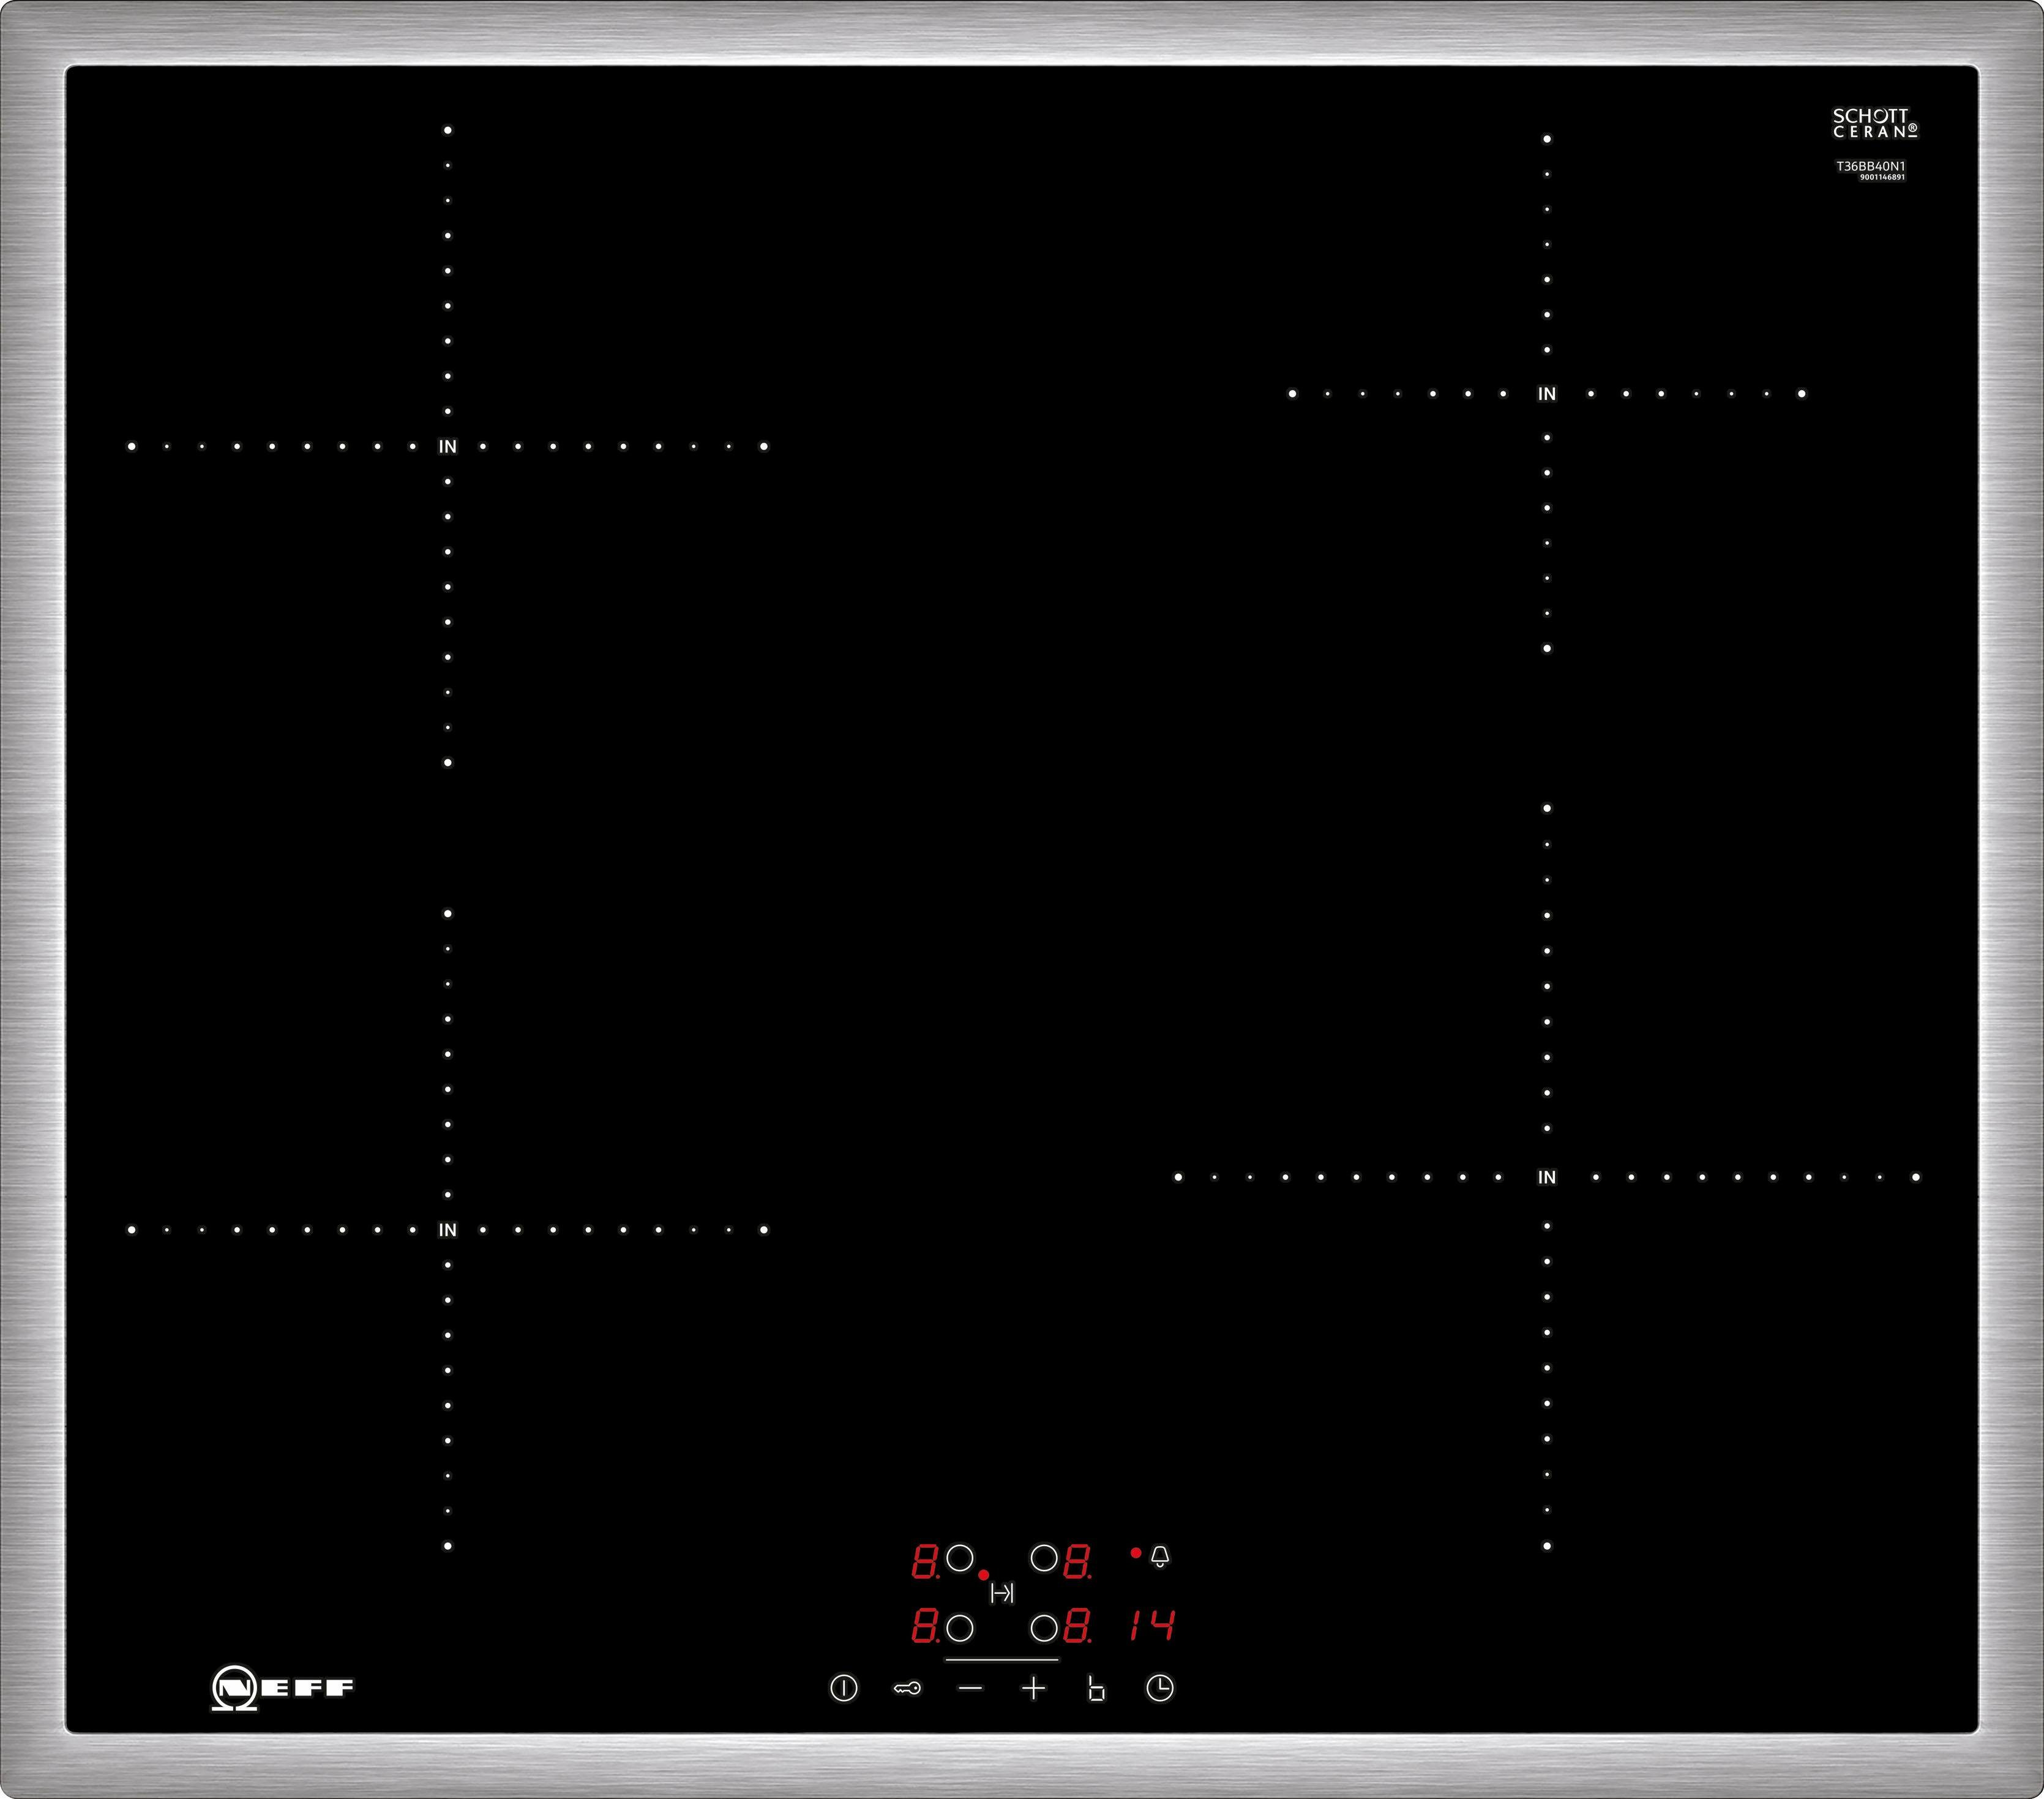 NEFF Induktions-Kochfeld TBB3640N / T36BB40N1, mit TouchControl-Bedienung